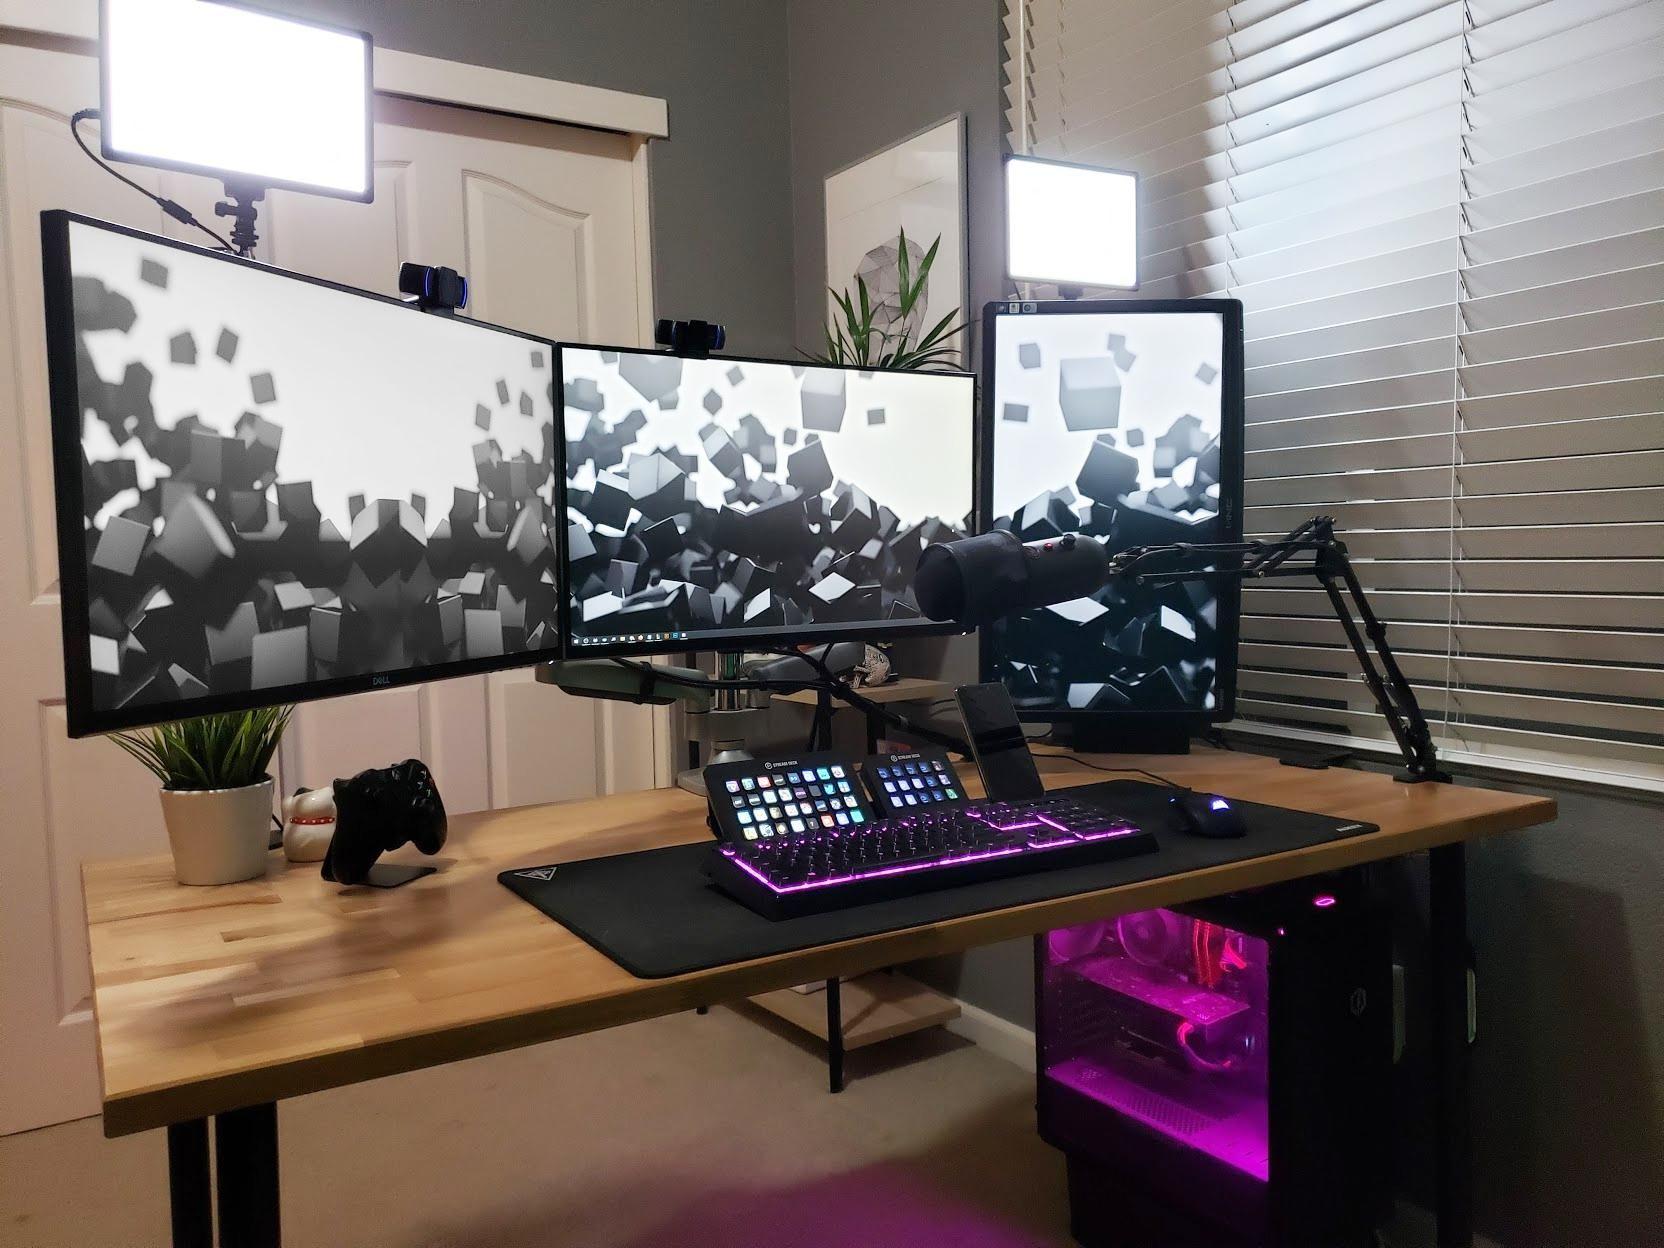 Home Office Streaming Studio In 2020 Home Office Setup Streaming Setup Room Setup